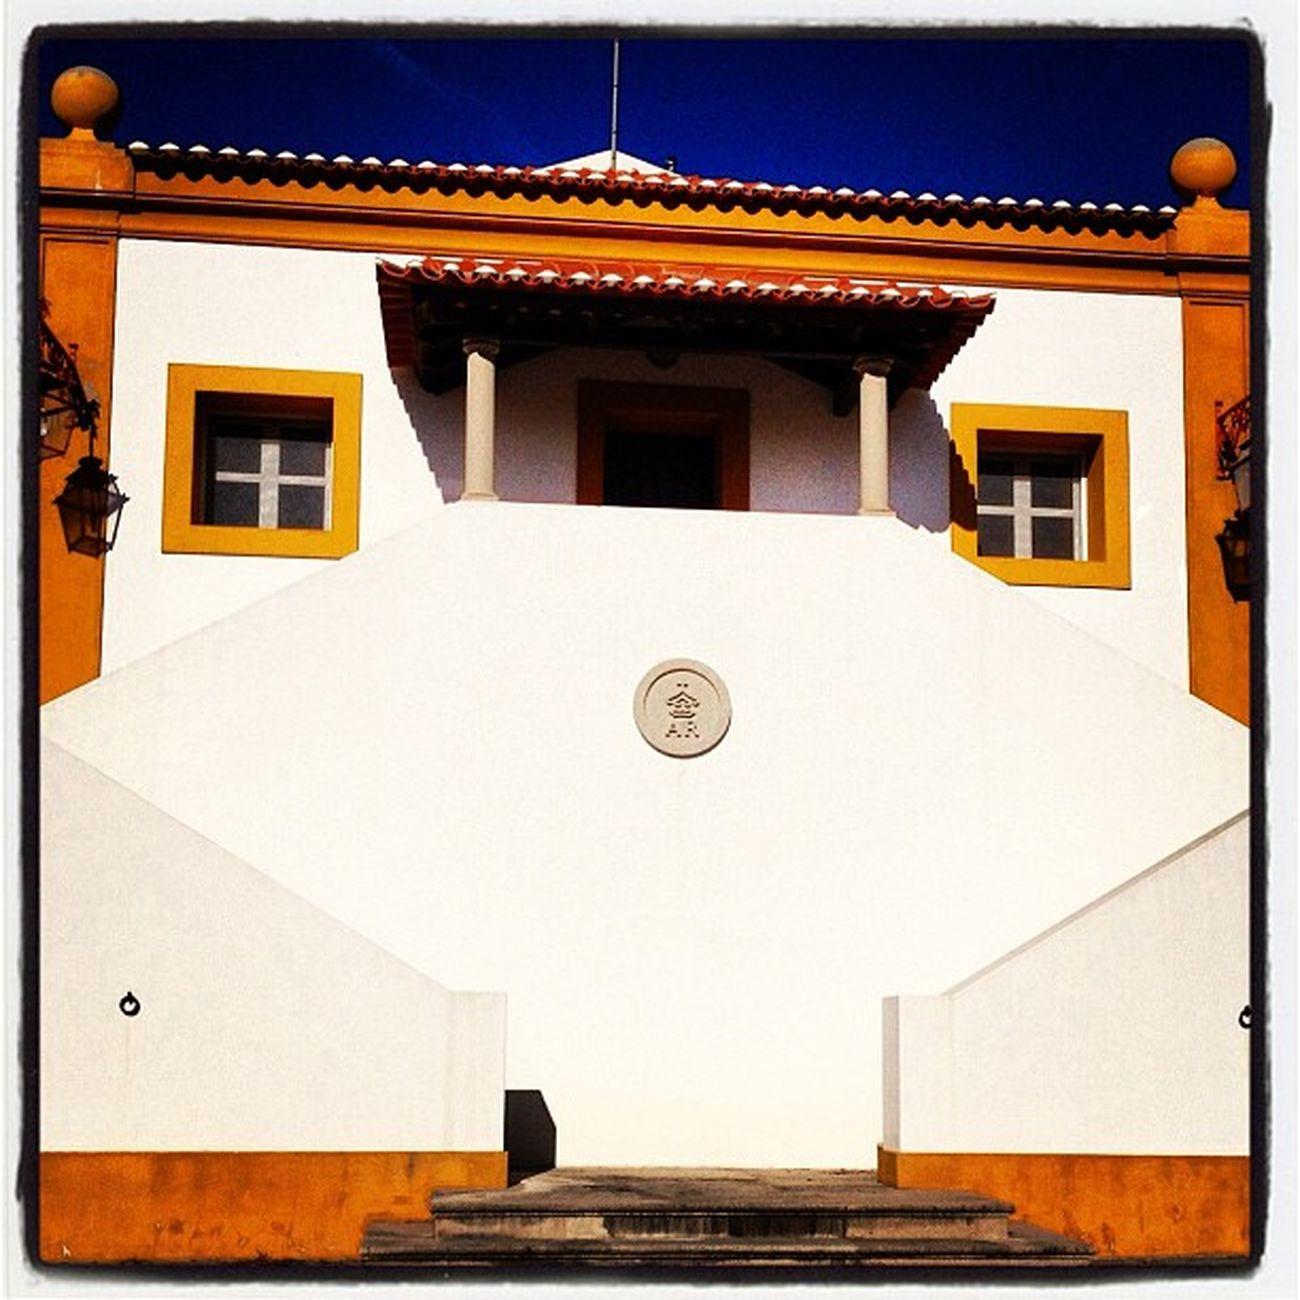 #alterdochao #portugaldenorteasul #portugaligers #igers #igersportugal #alentejo #iphone5 #iphonesia #iphonephotography #iphoneonly #portugaldenorteasul #instagood #instagram #instalove #instamood #instagramers #instagramhub #pictureoftheday #photooftheda Instagood Instagramhub Pictureoftheday Photography Instalove Horses Portugaligers Iphoneonly Igersportugal Photooftheday Portugaldenorteasul Iphonesia Alterreal Instagram Alterdochao IPhone5 Coudelariadealter Instamood Iphonephotography Cavalos Igers Alentejo Instagramers